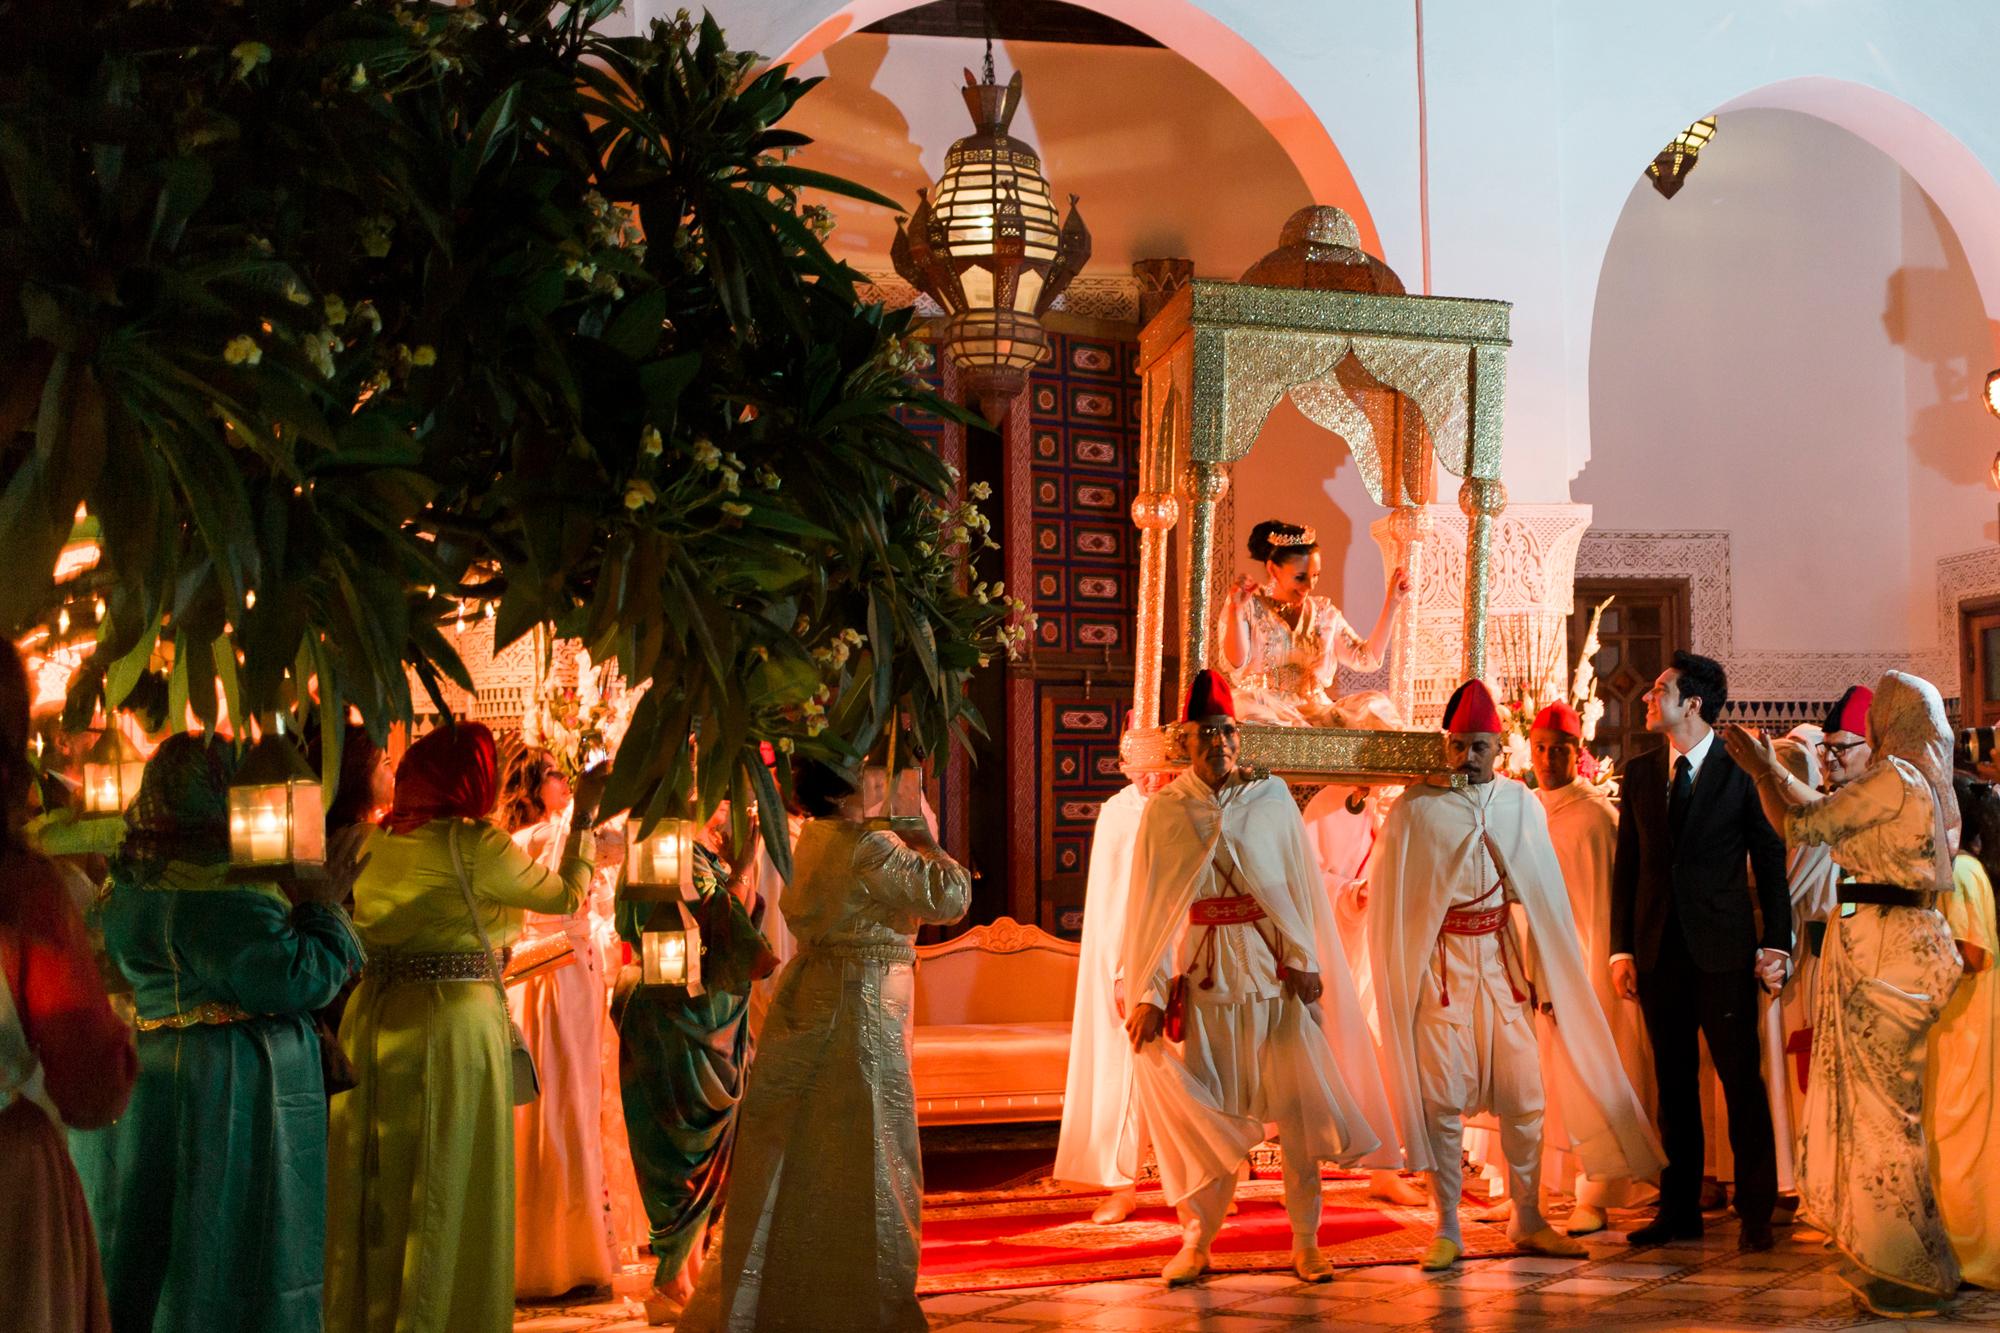 marrakech-morocco-destination-wedding-lilouette-28.jpg